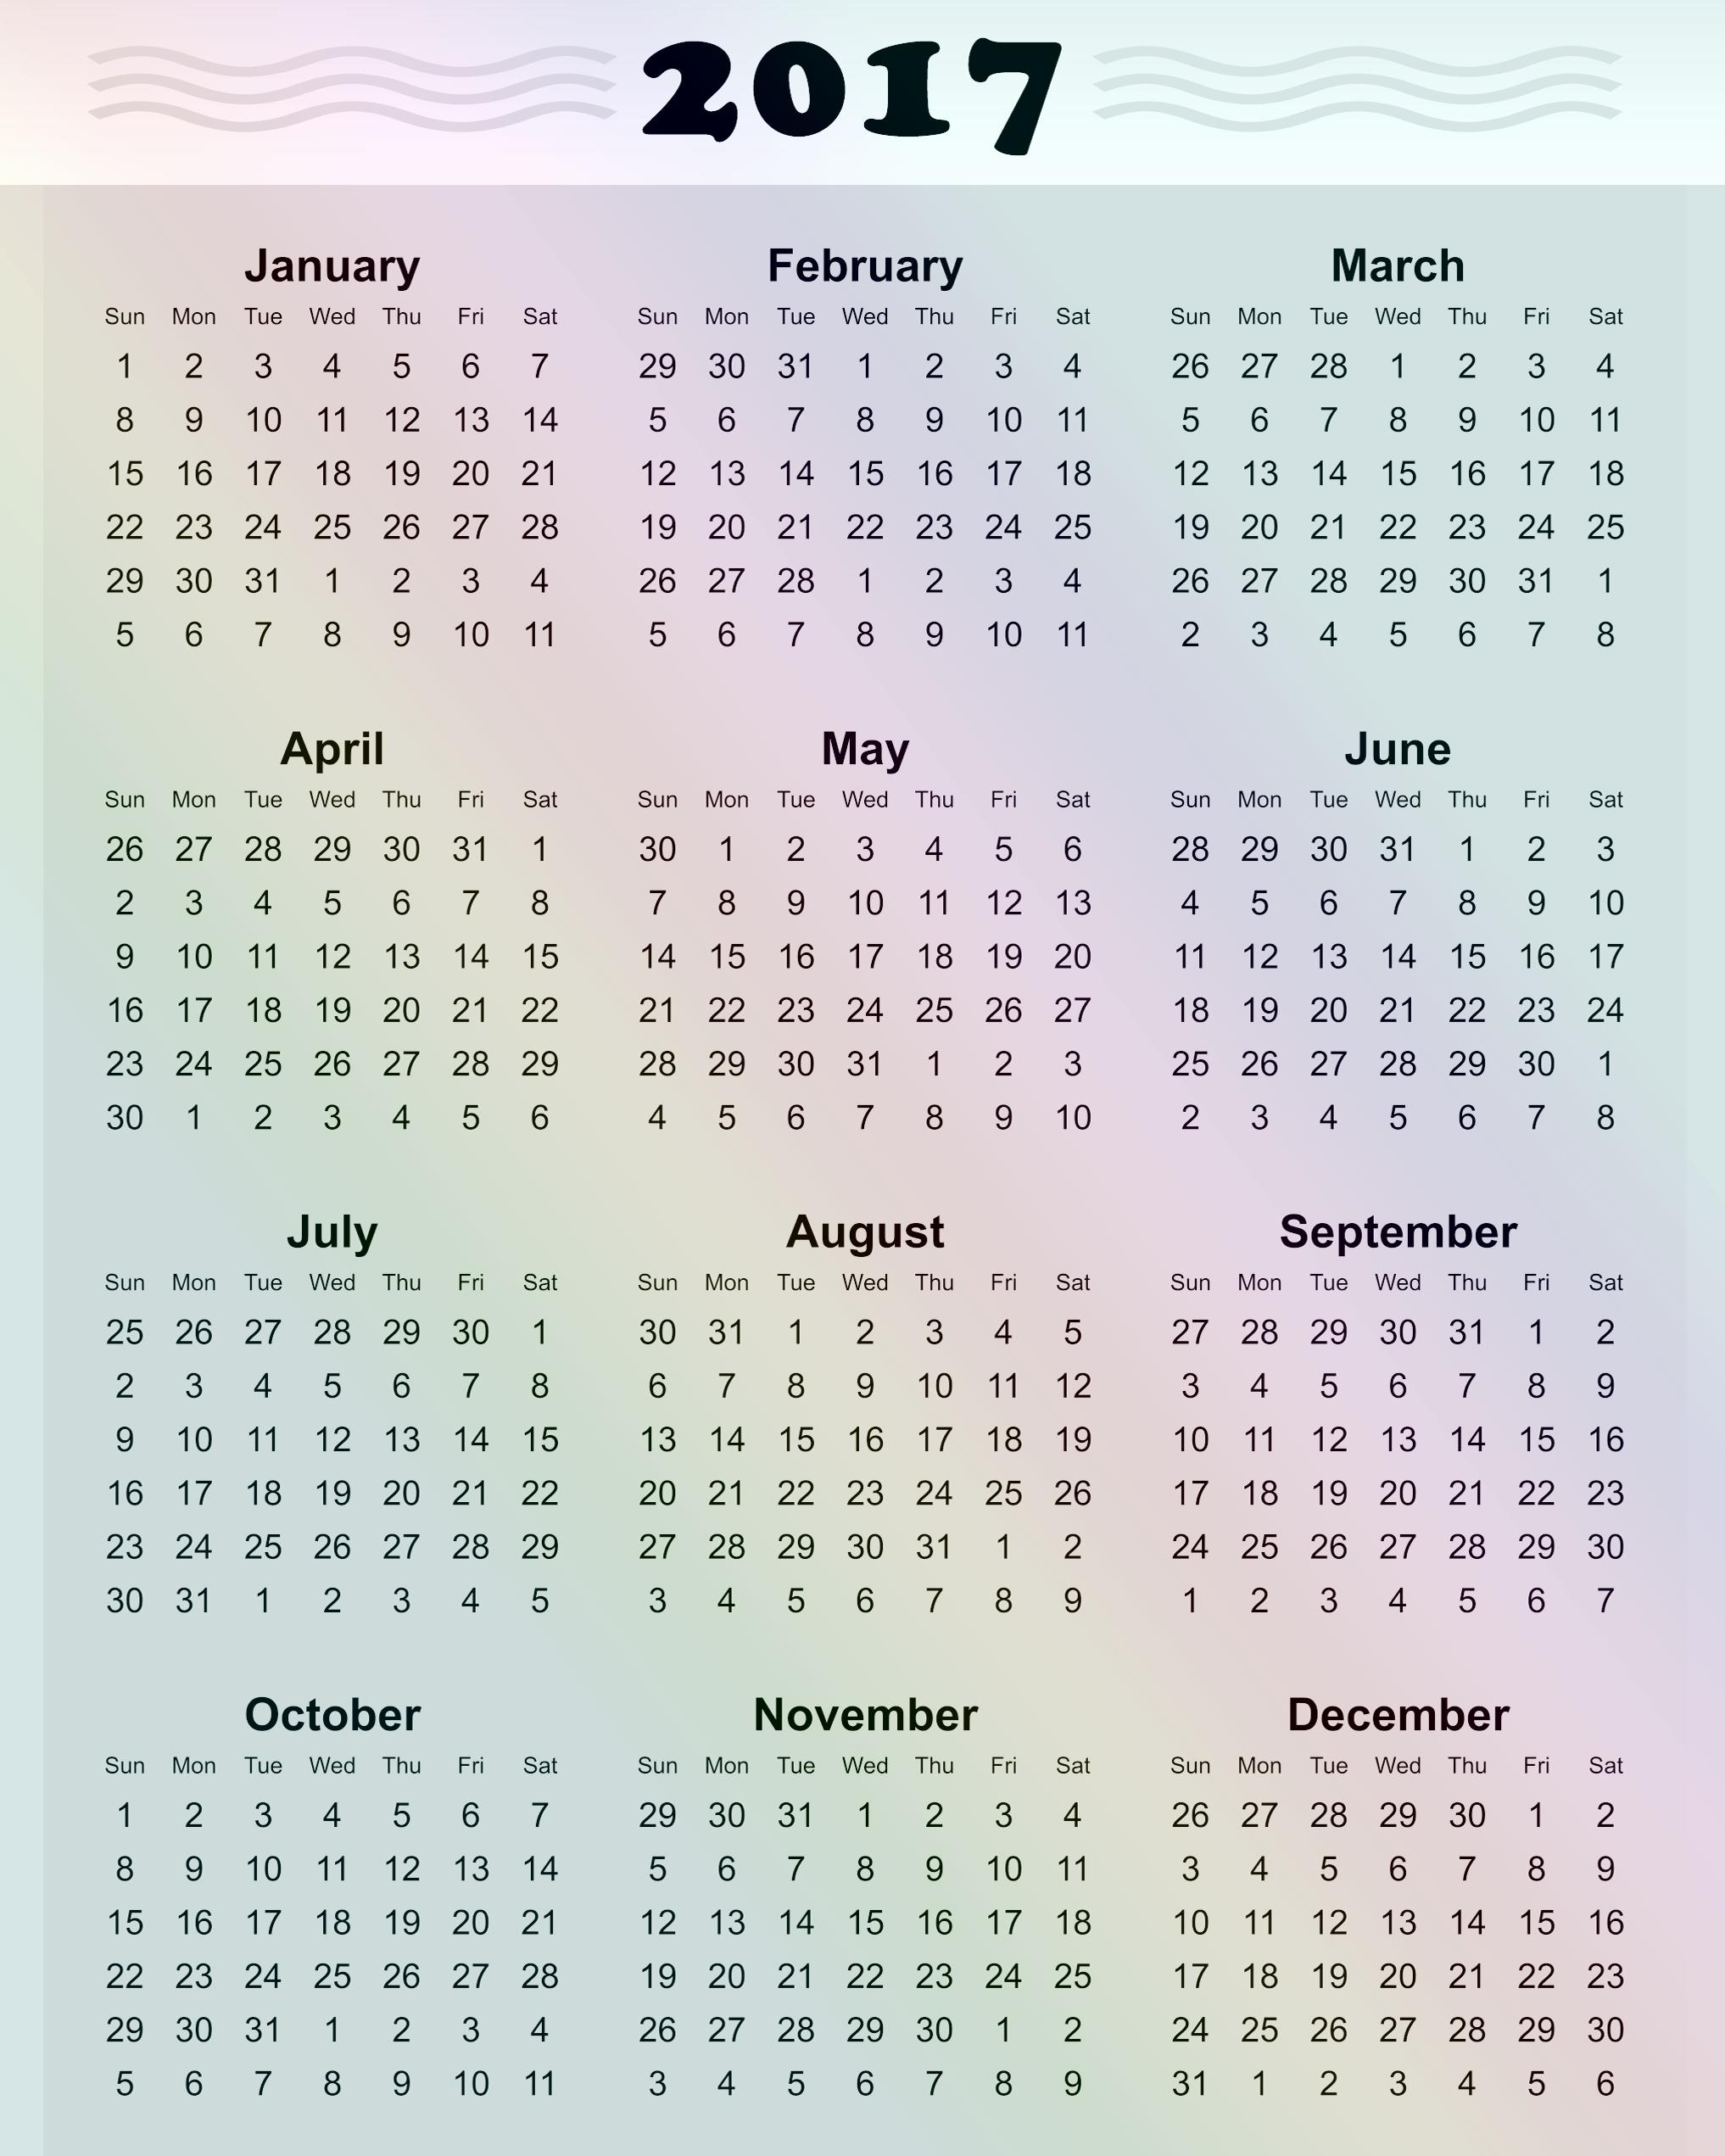 Excel 2017 Calendar with Holidays Inspirational 2017 Printable Calendar Template Holidays Excel & Word